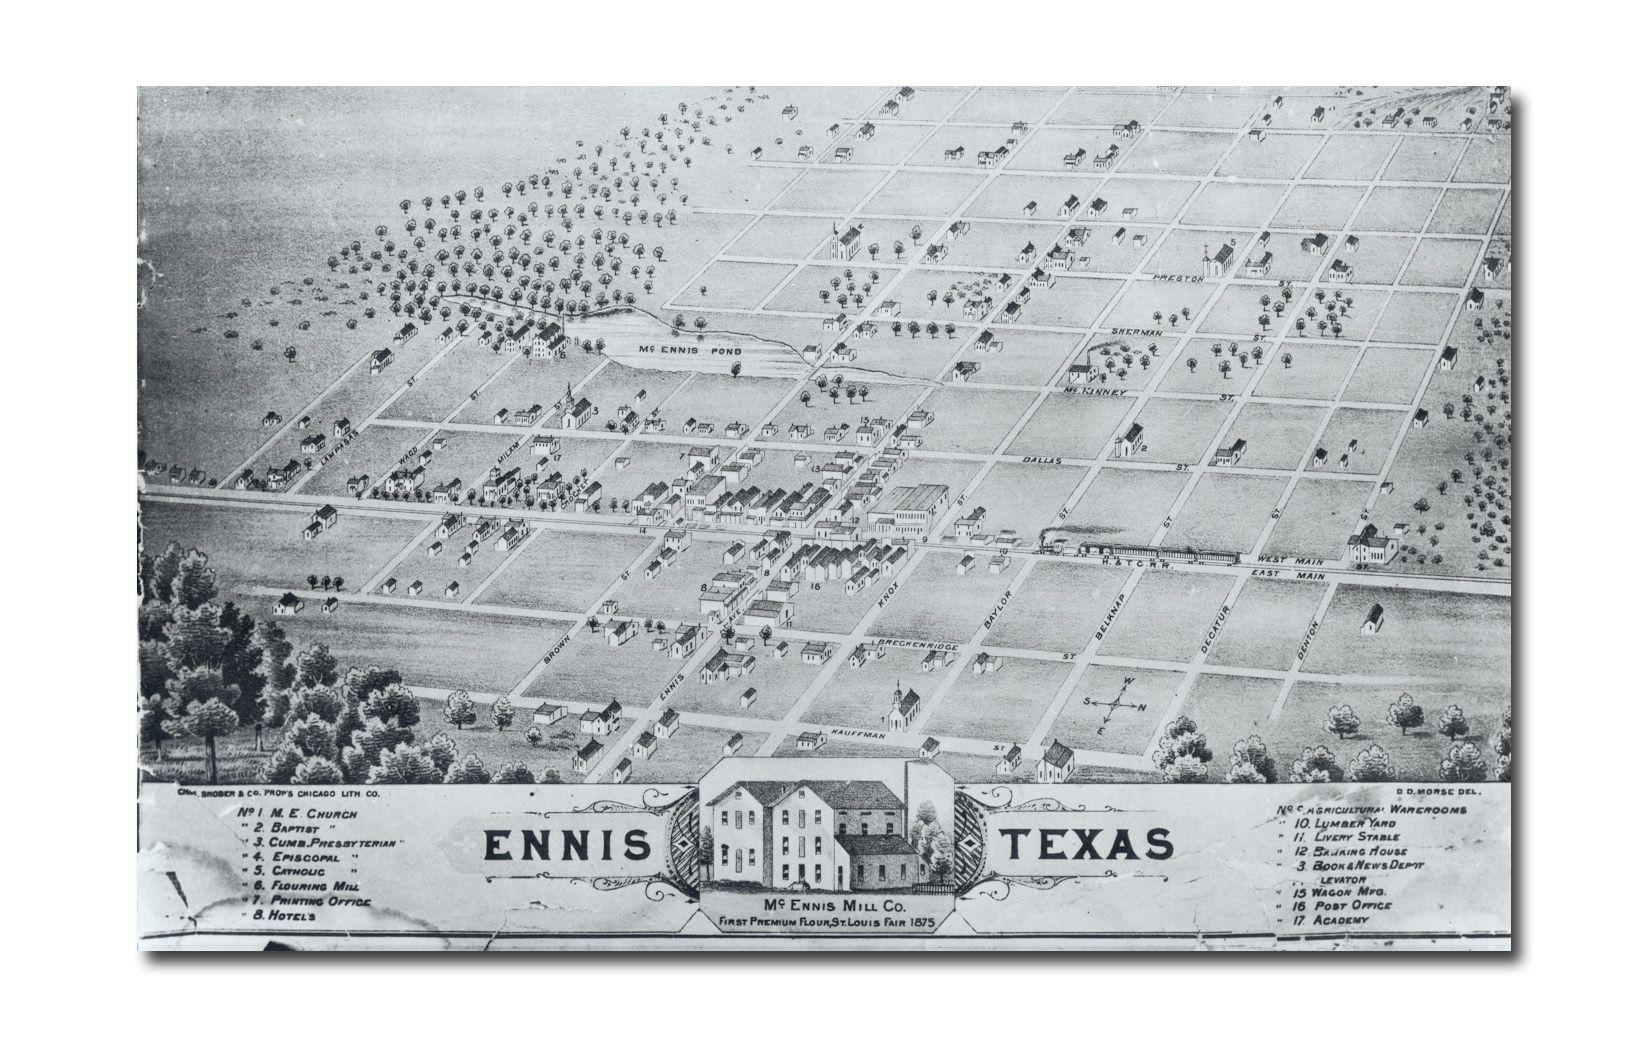 Ennis City Map - Ennis Texas • Mappery   Genealogy   Ennis Texas - Ennis Texas Map